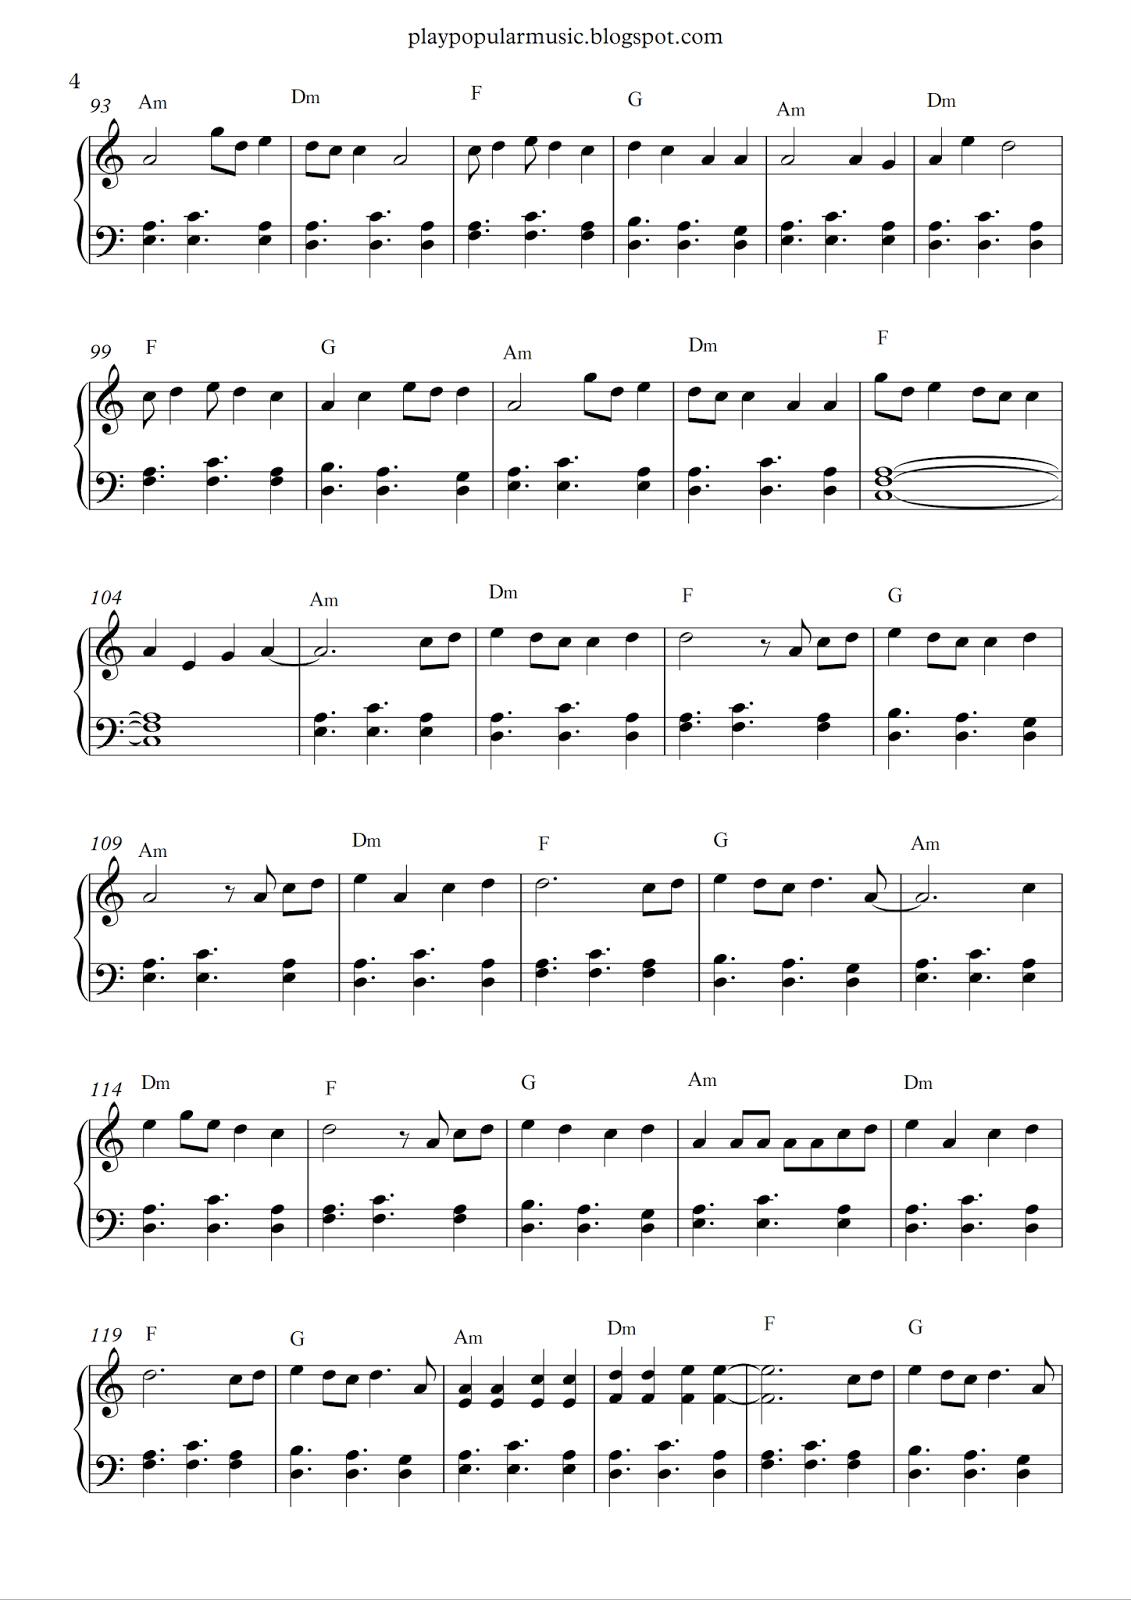 Free Piano Sheet Music Shape Of You Ed Sheeran Pdf Your Love Was Handmade For Somebody Like Me Piano Sheet Music Piano Sheet Music Free Easy Sheet Music